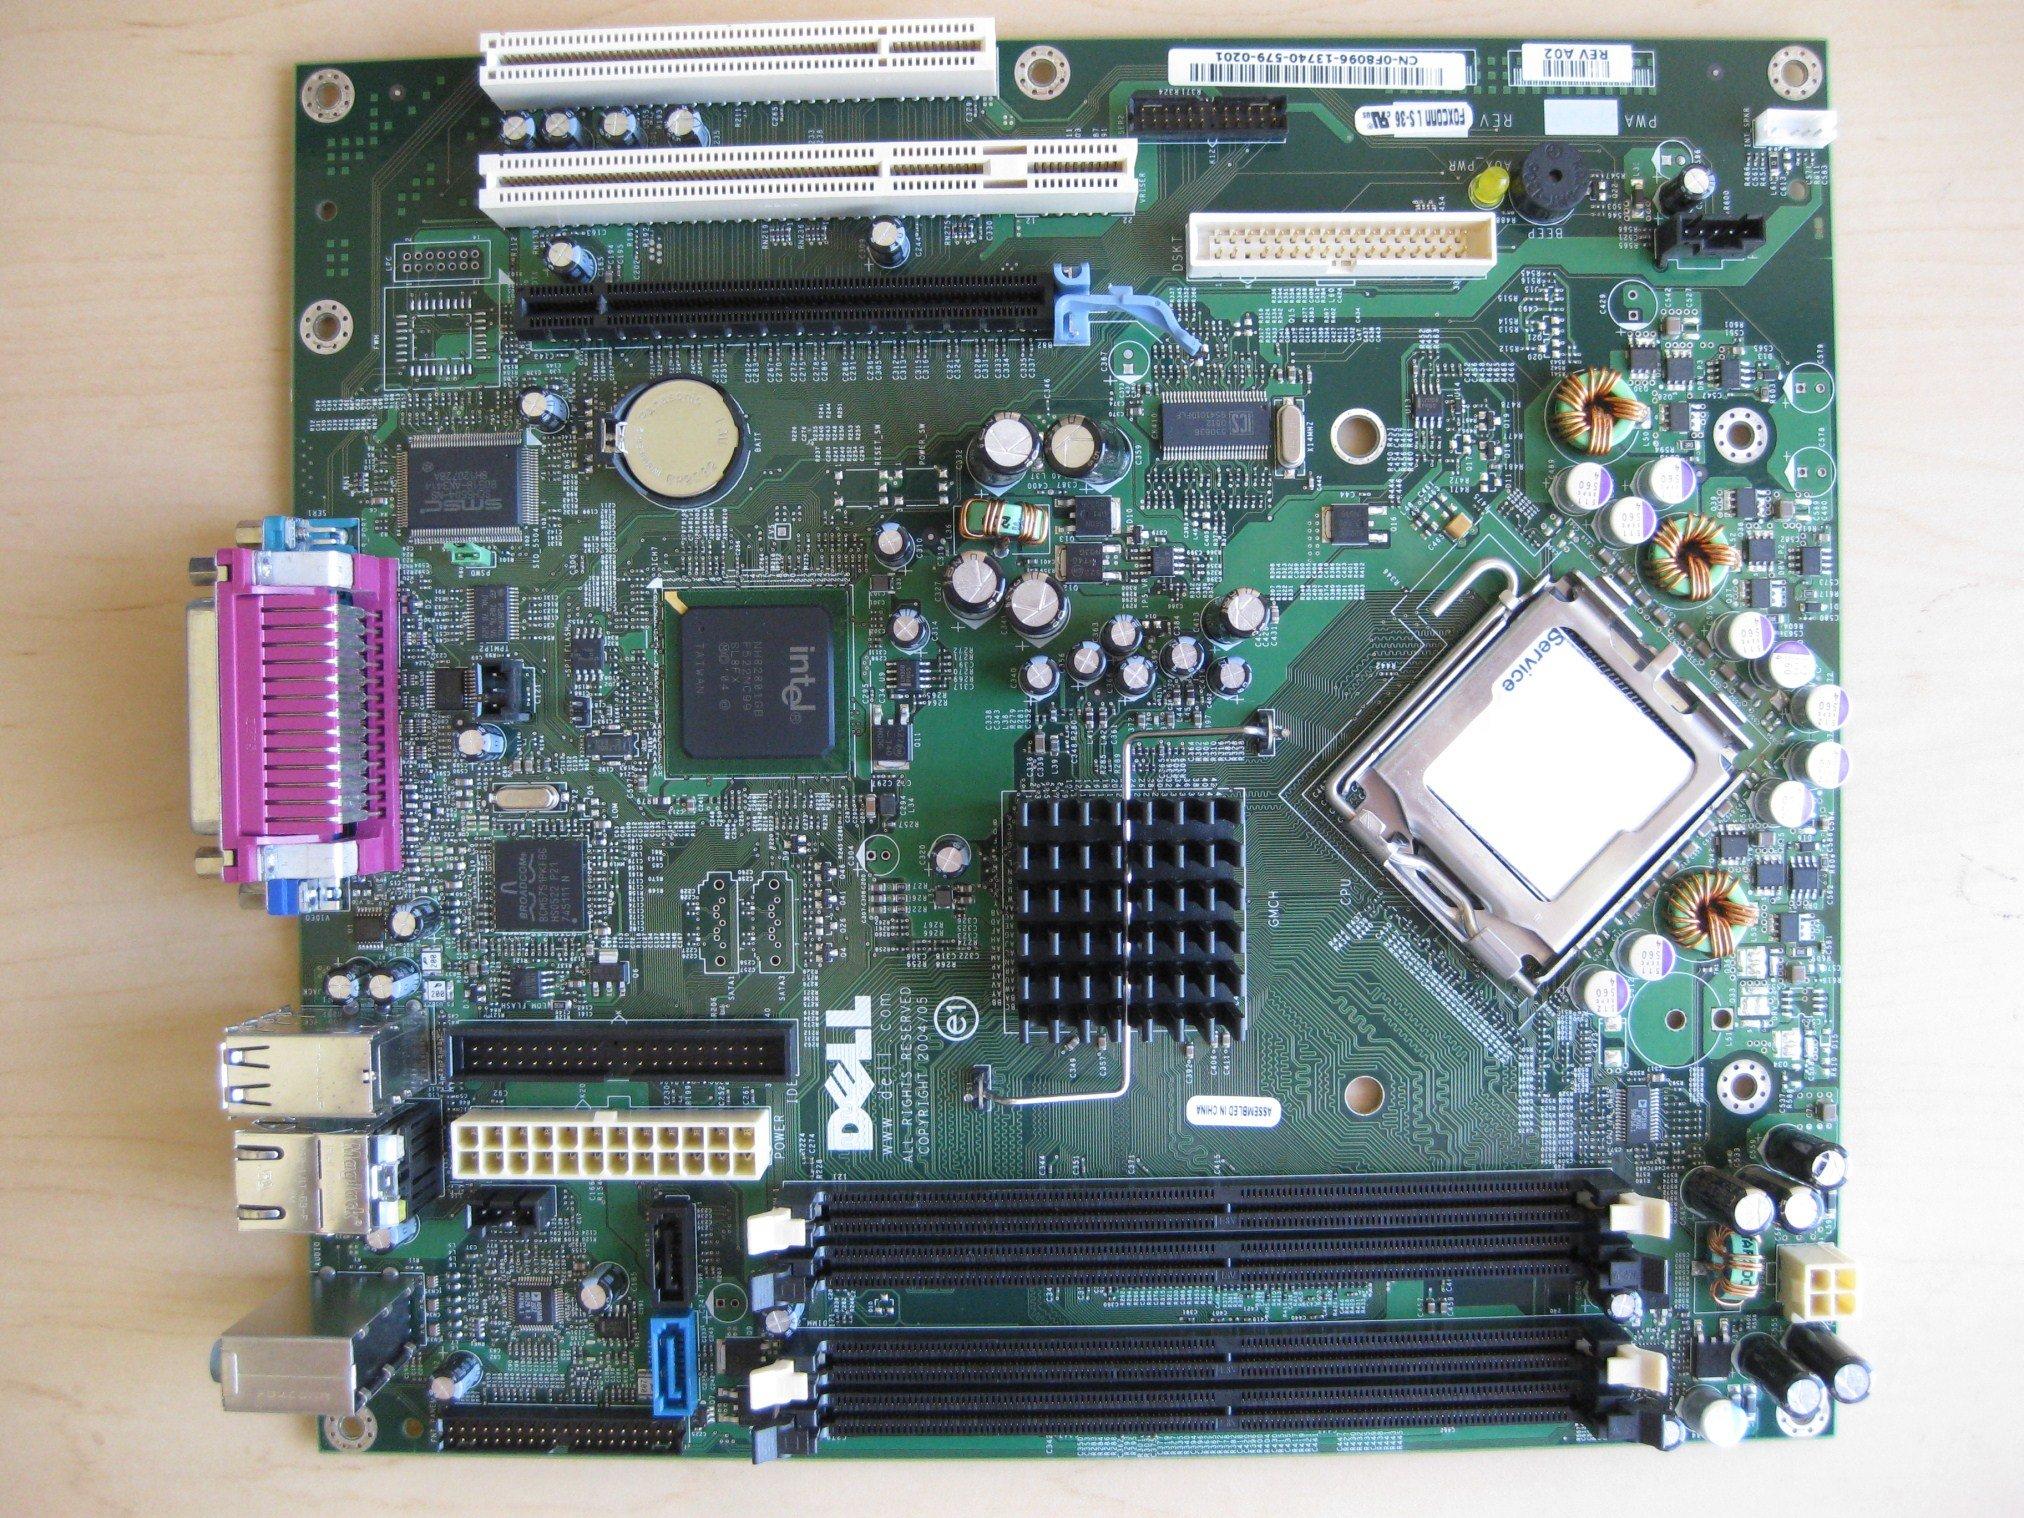 Dell Genuine FH884 ND237 F8096 GX620 Desktop DT Intel 945 Express LGA775 Socket 755 System Computer Logic Main System Board Compatible Part Numbers: ND237, F8096, FH884, HJ781, X9681, CJ335